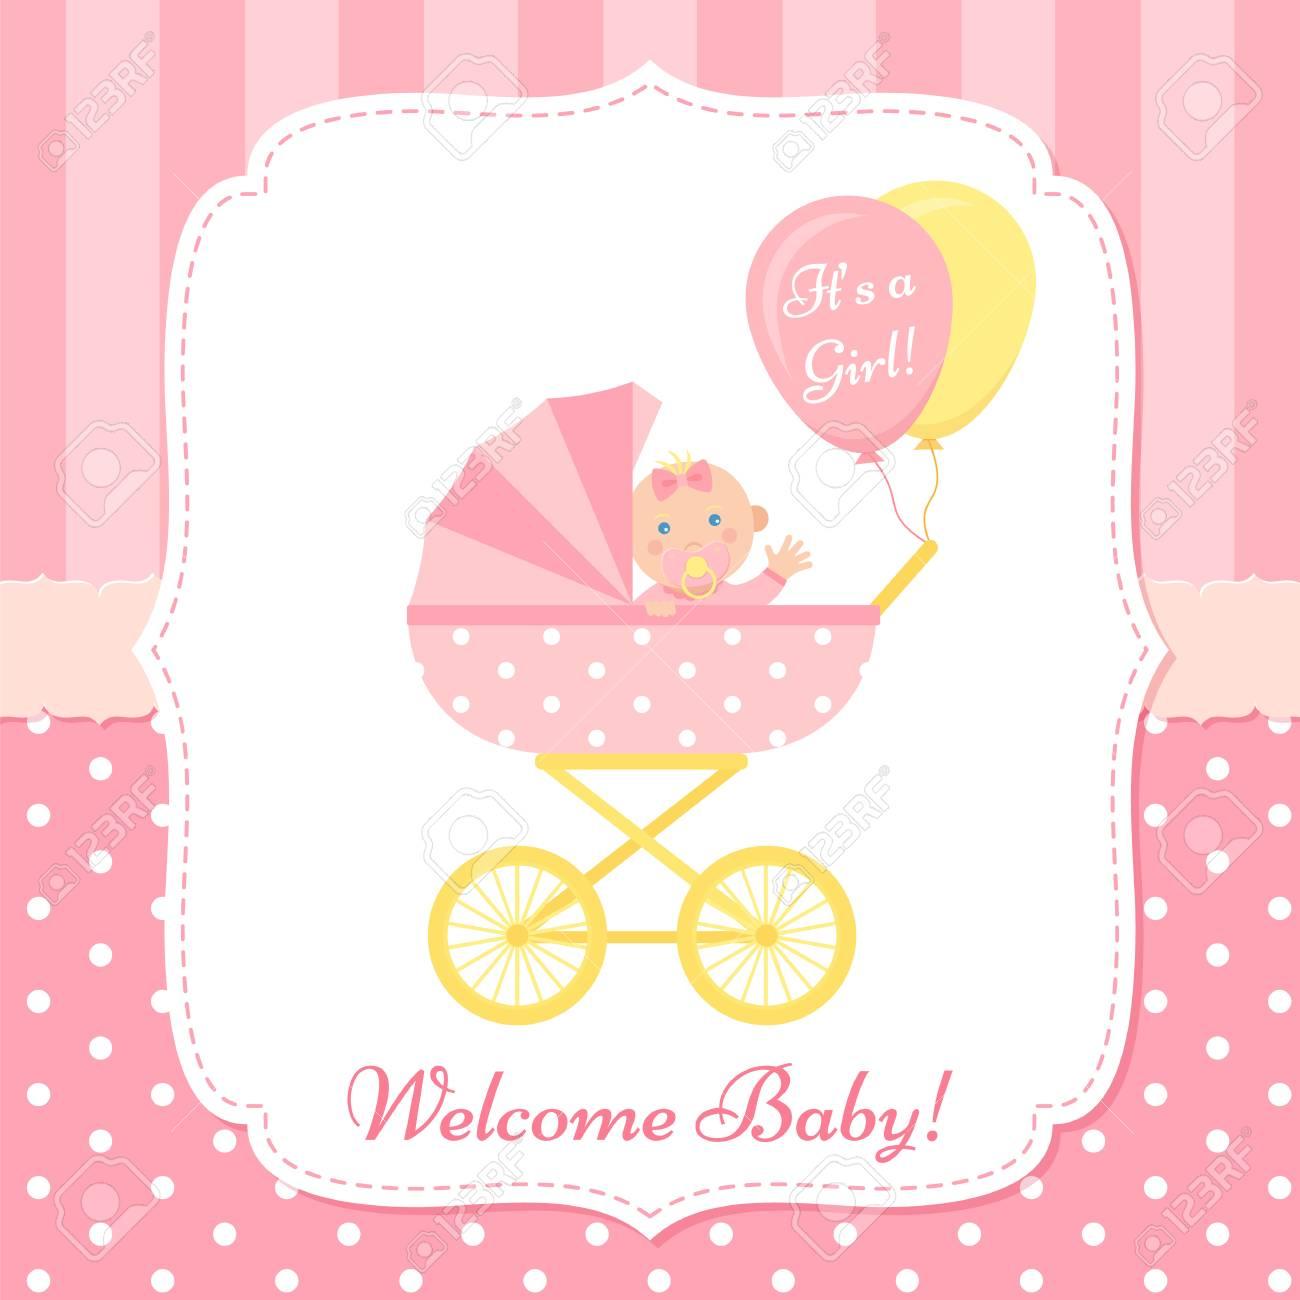 Baby Girl Invite Card Vector Baby Shower Banner Pink Design